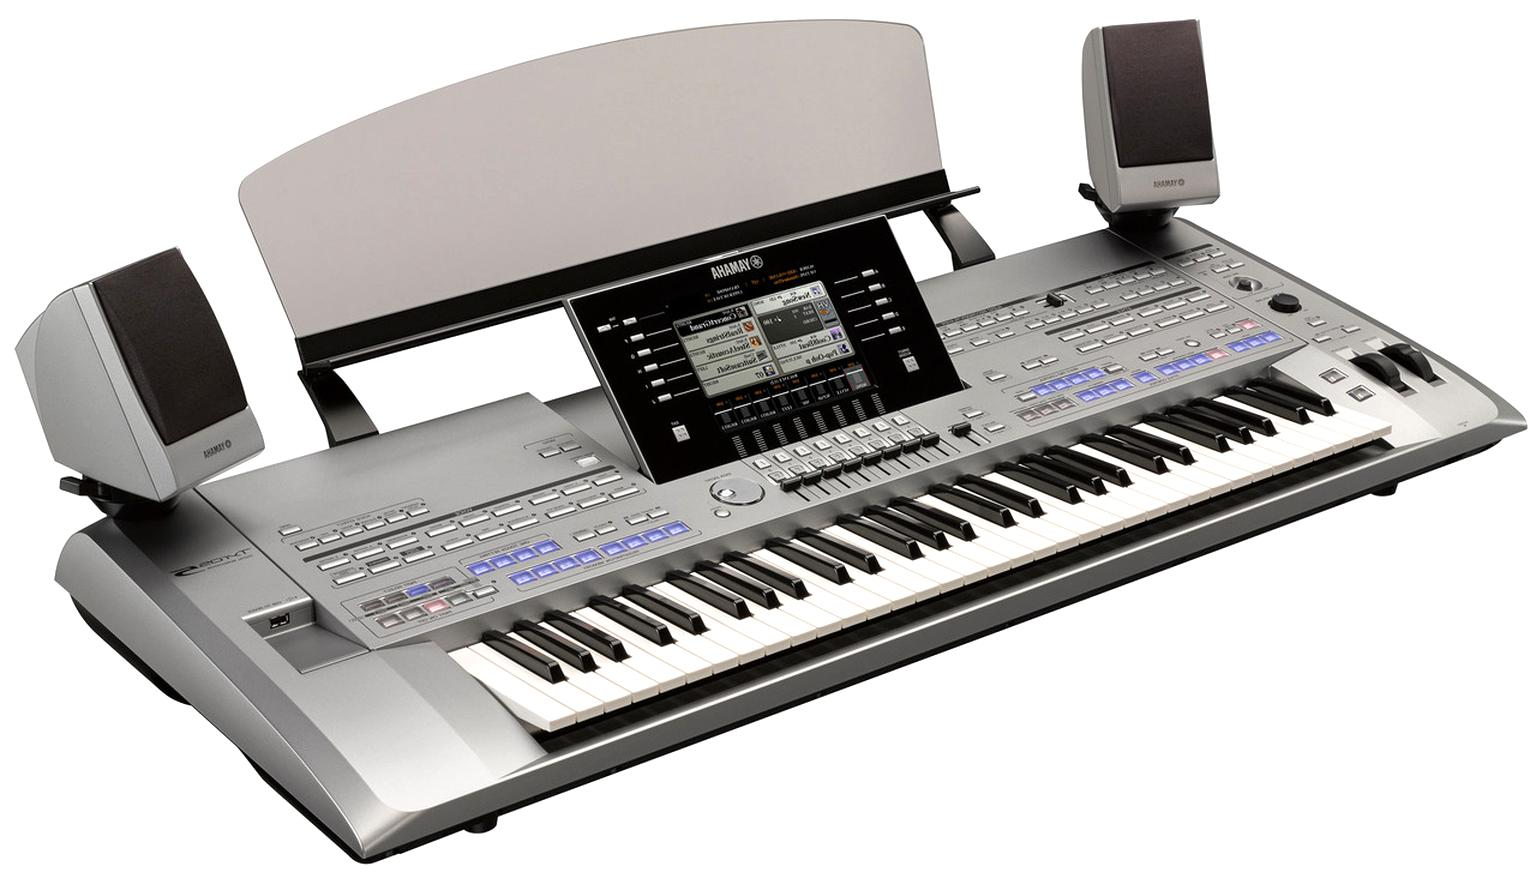 yamaha keyboard tyros gebraucht kaufen